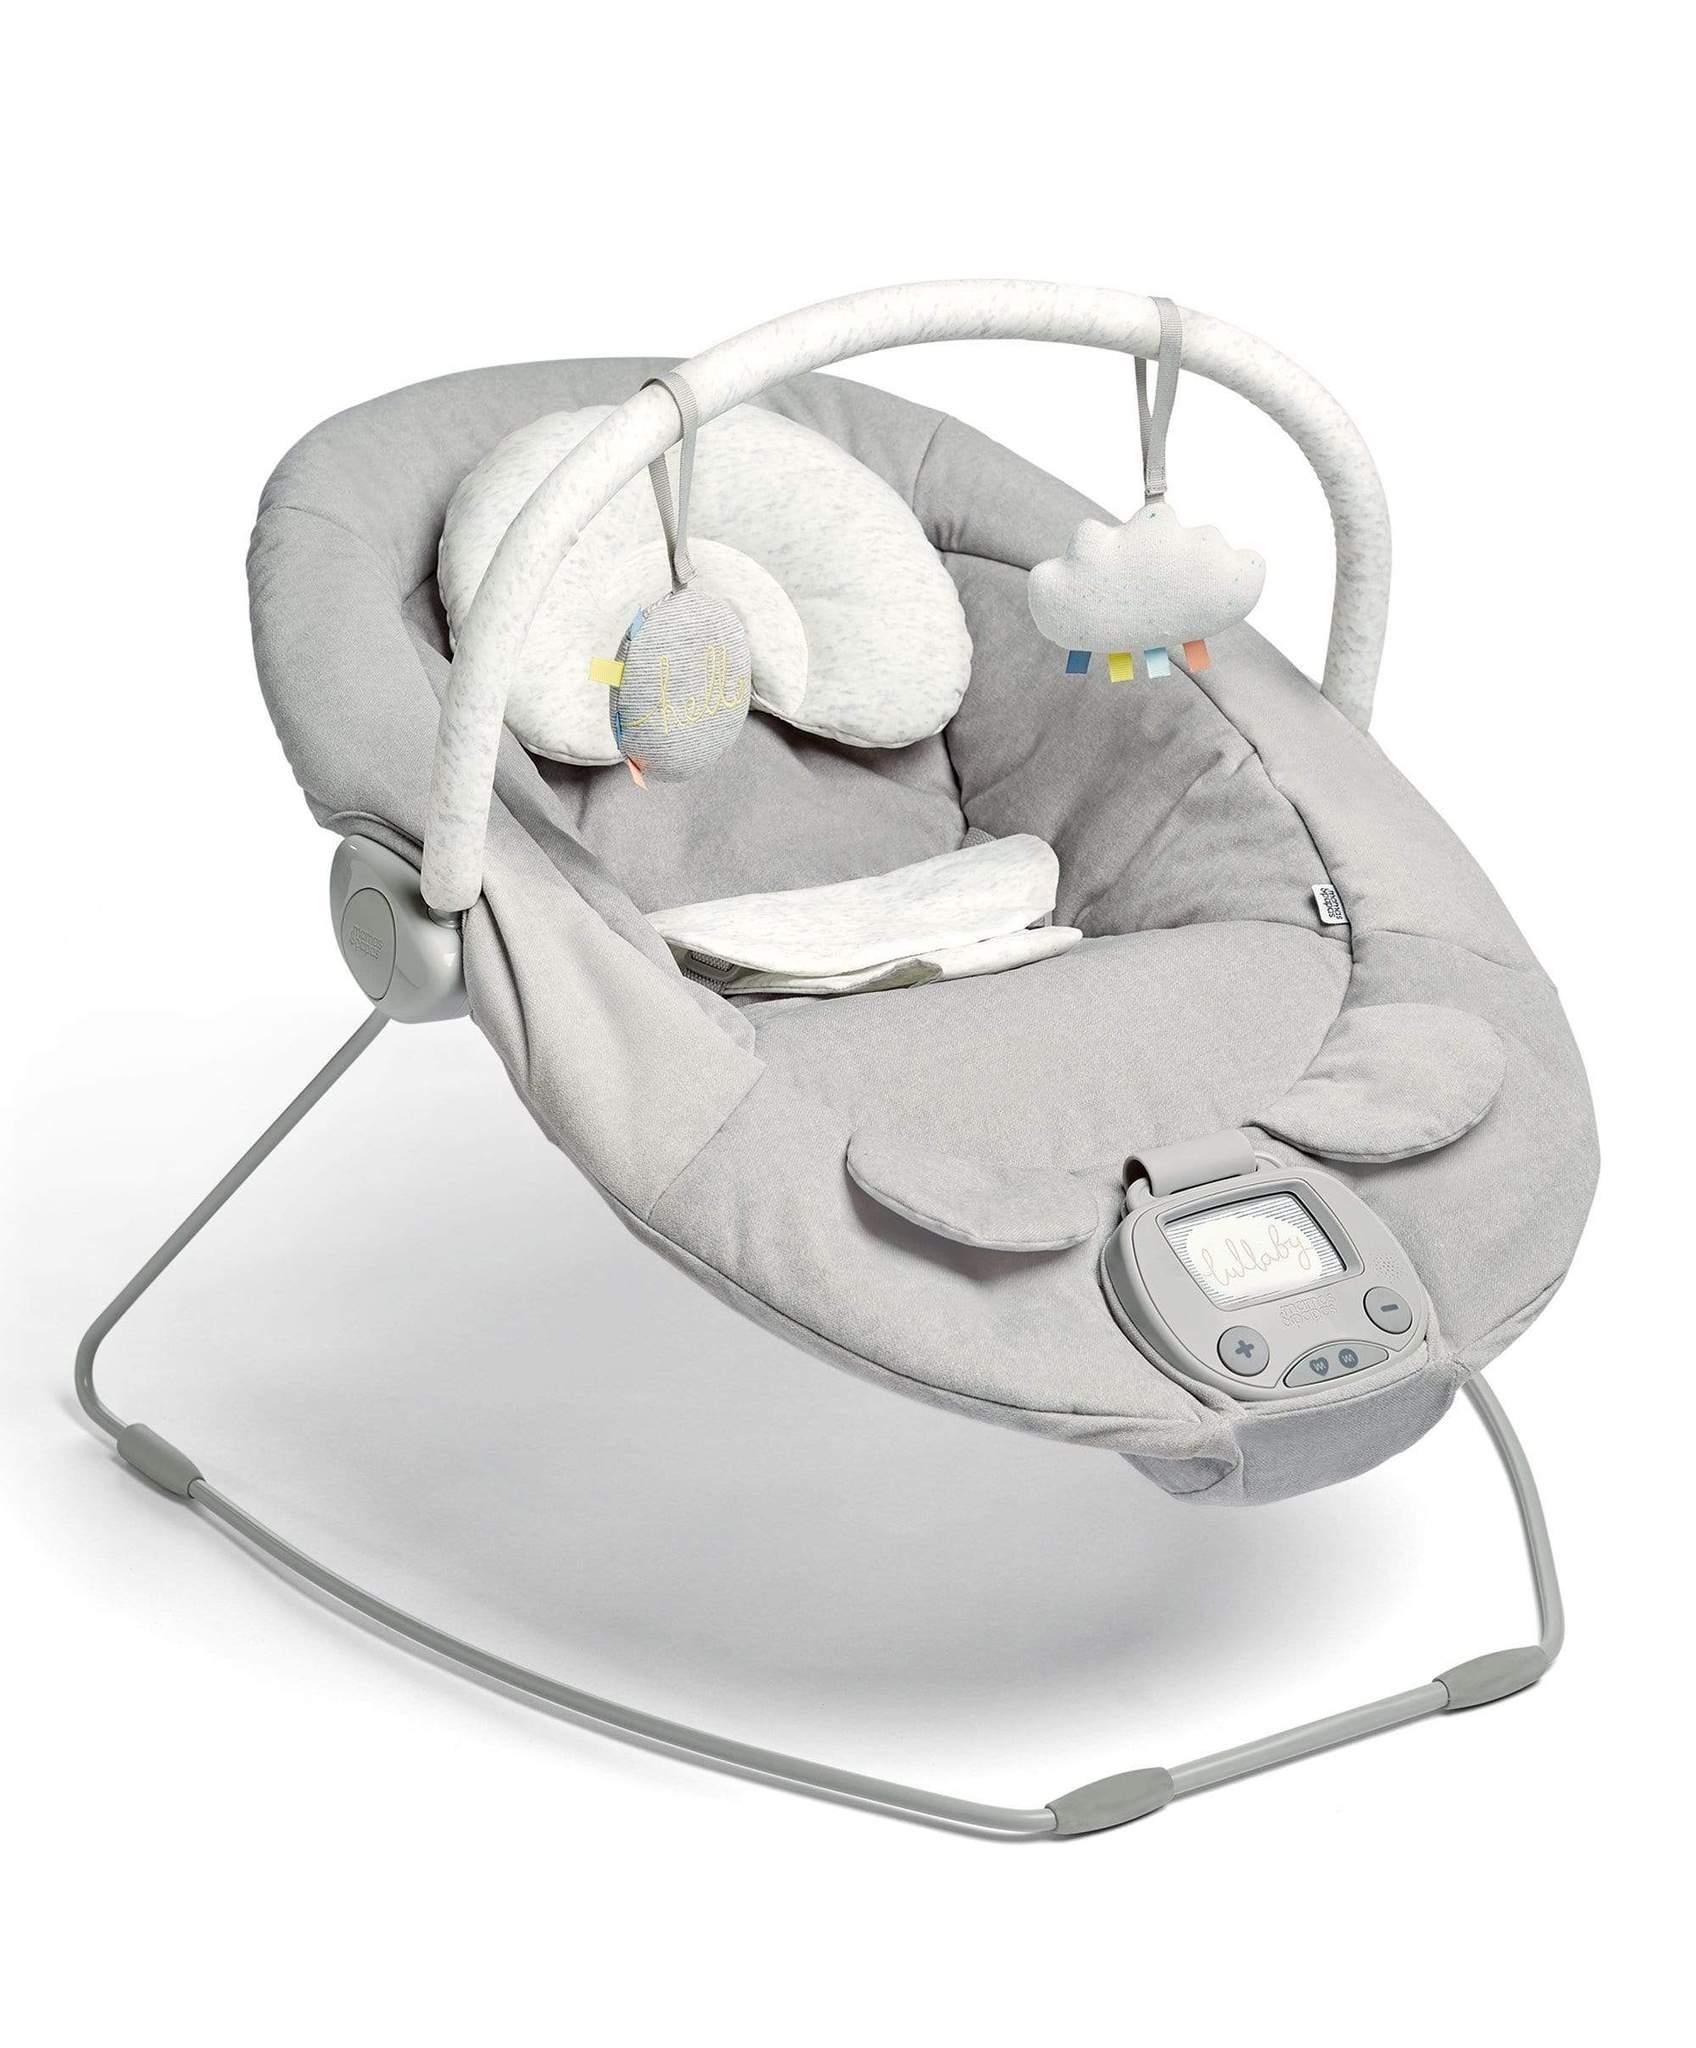 mamas-papas-bouncers-apollo-bouncing-cradle-pebble-grey-18930141986981_1024x1024@2x